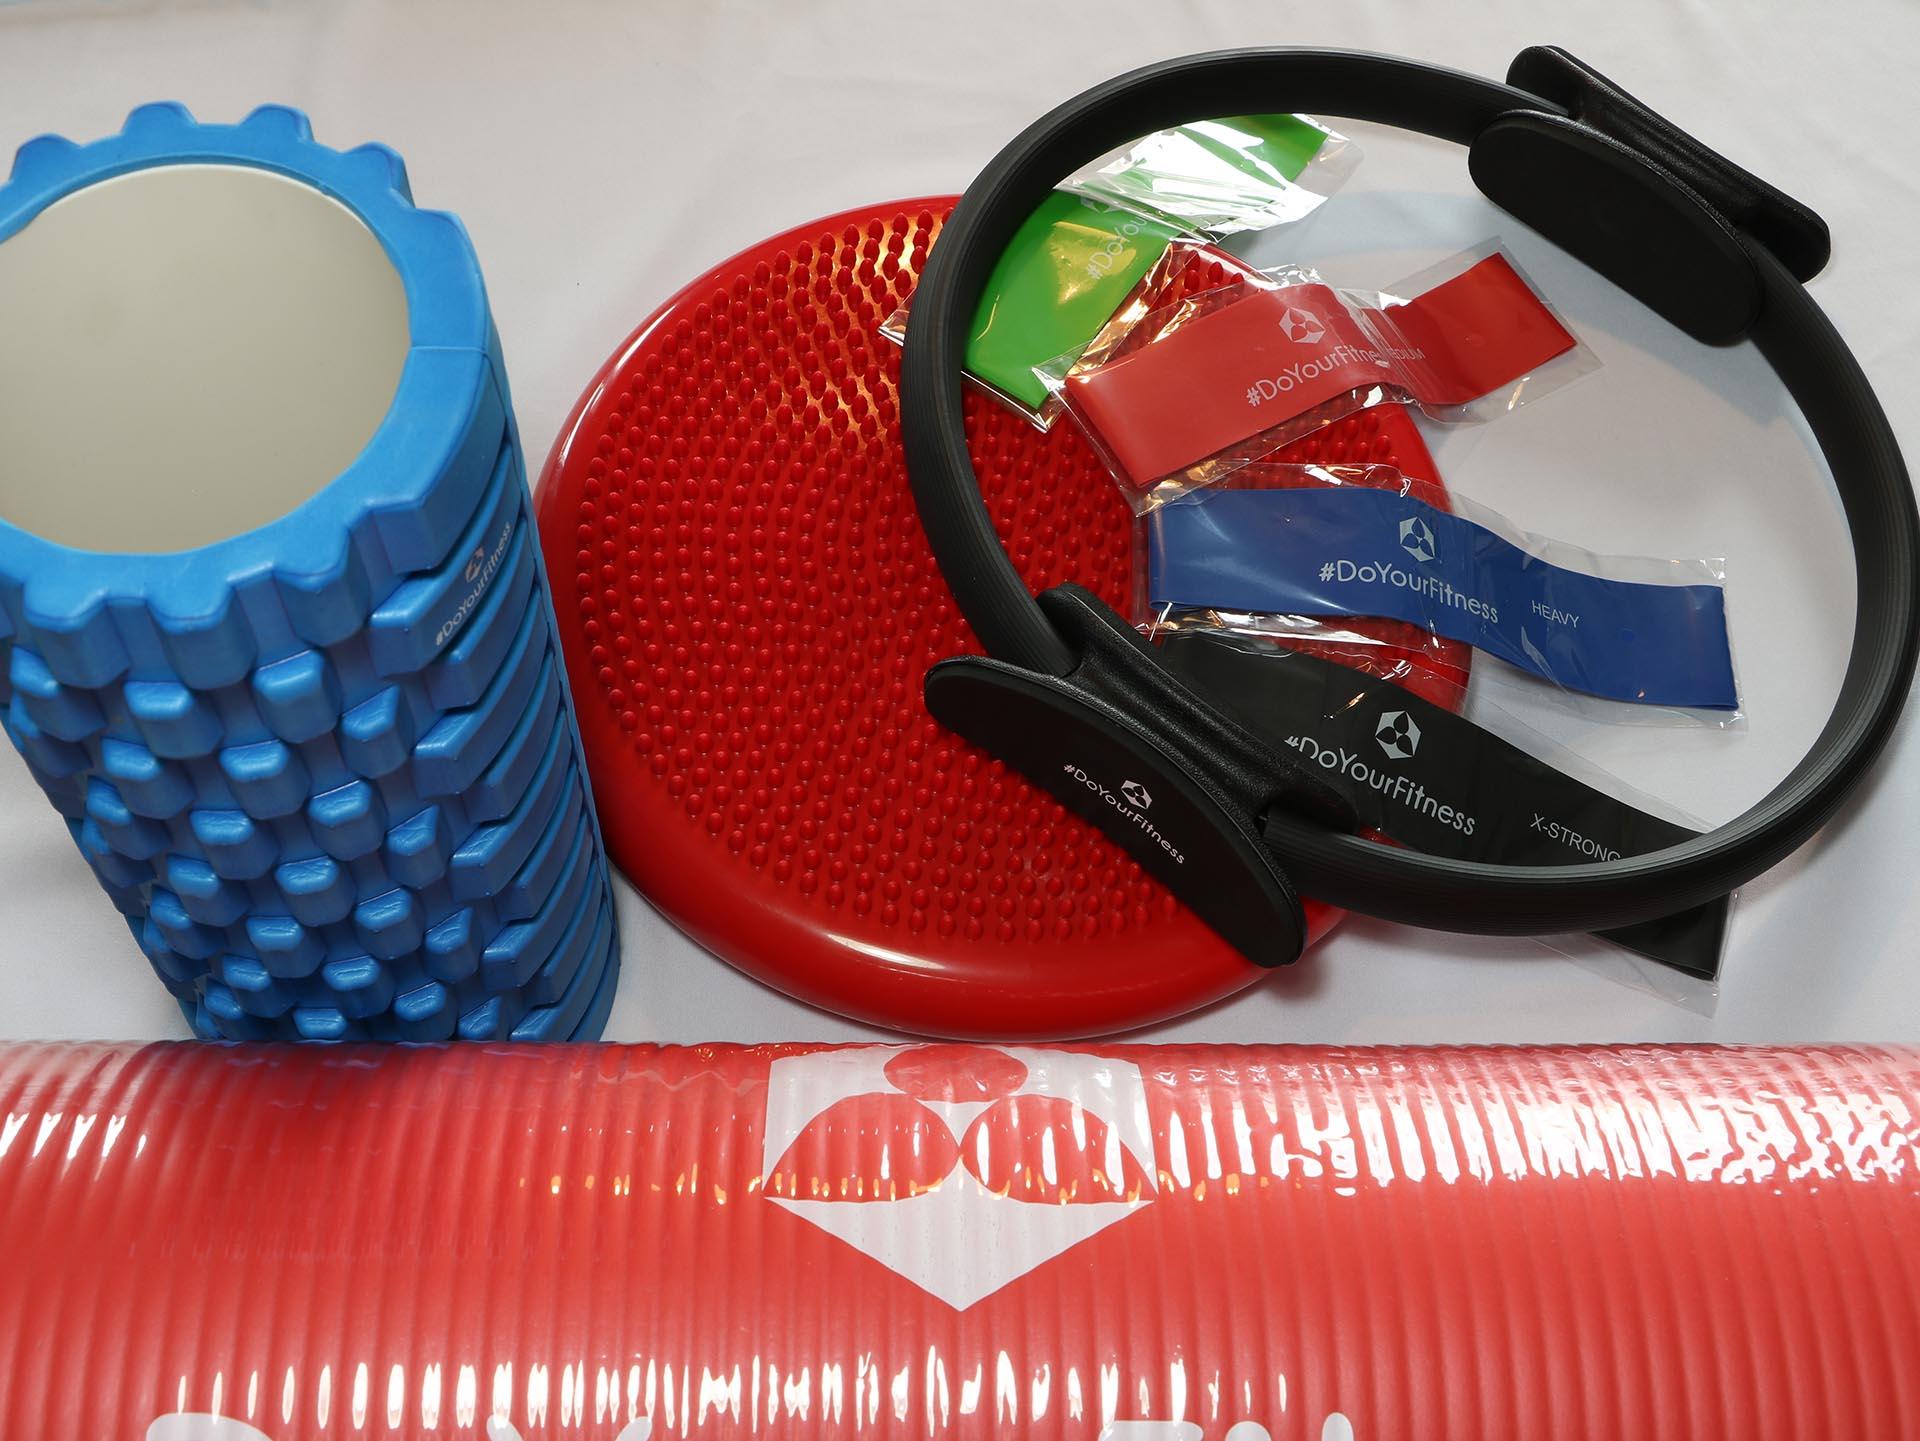 Pilates Ring, Trainigsmatte, Fitnessbänder, Faszienrolle, Ballsitzkissen